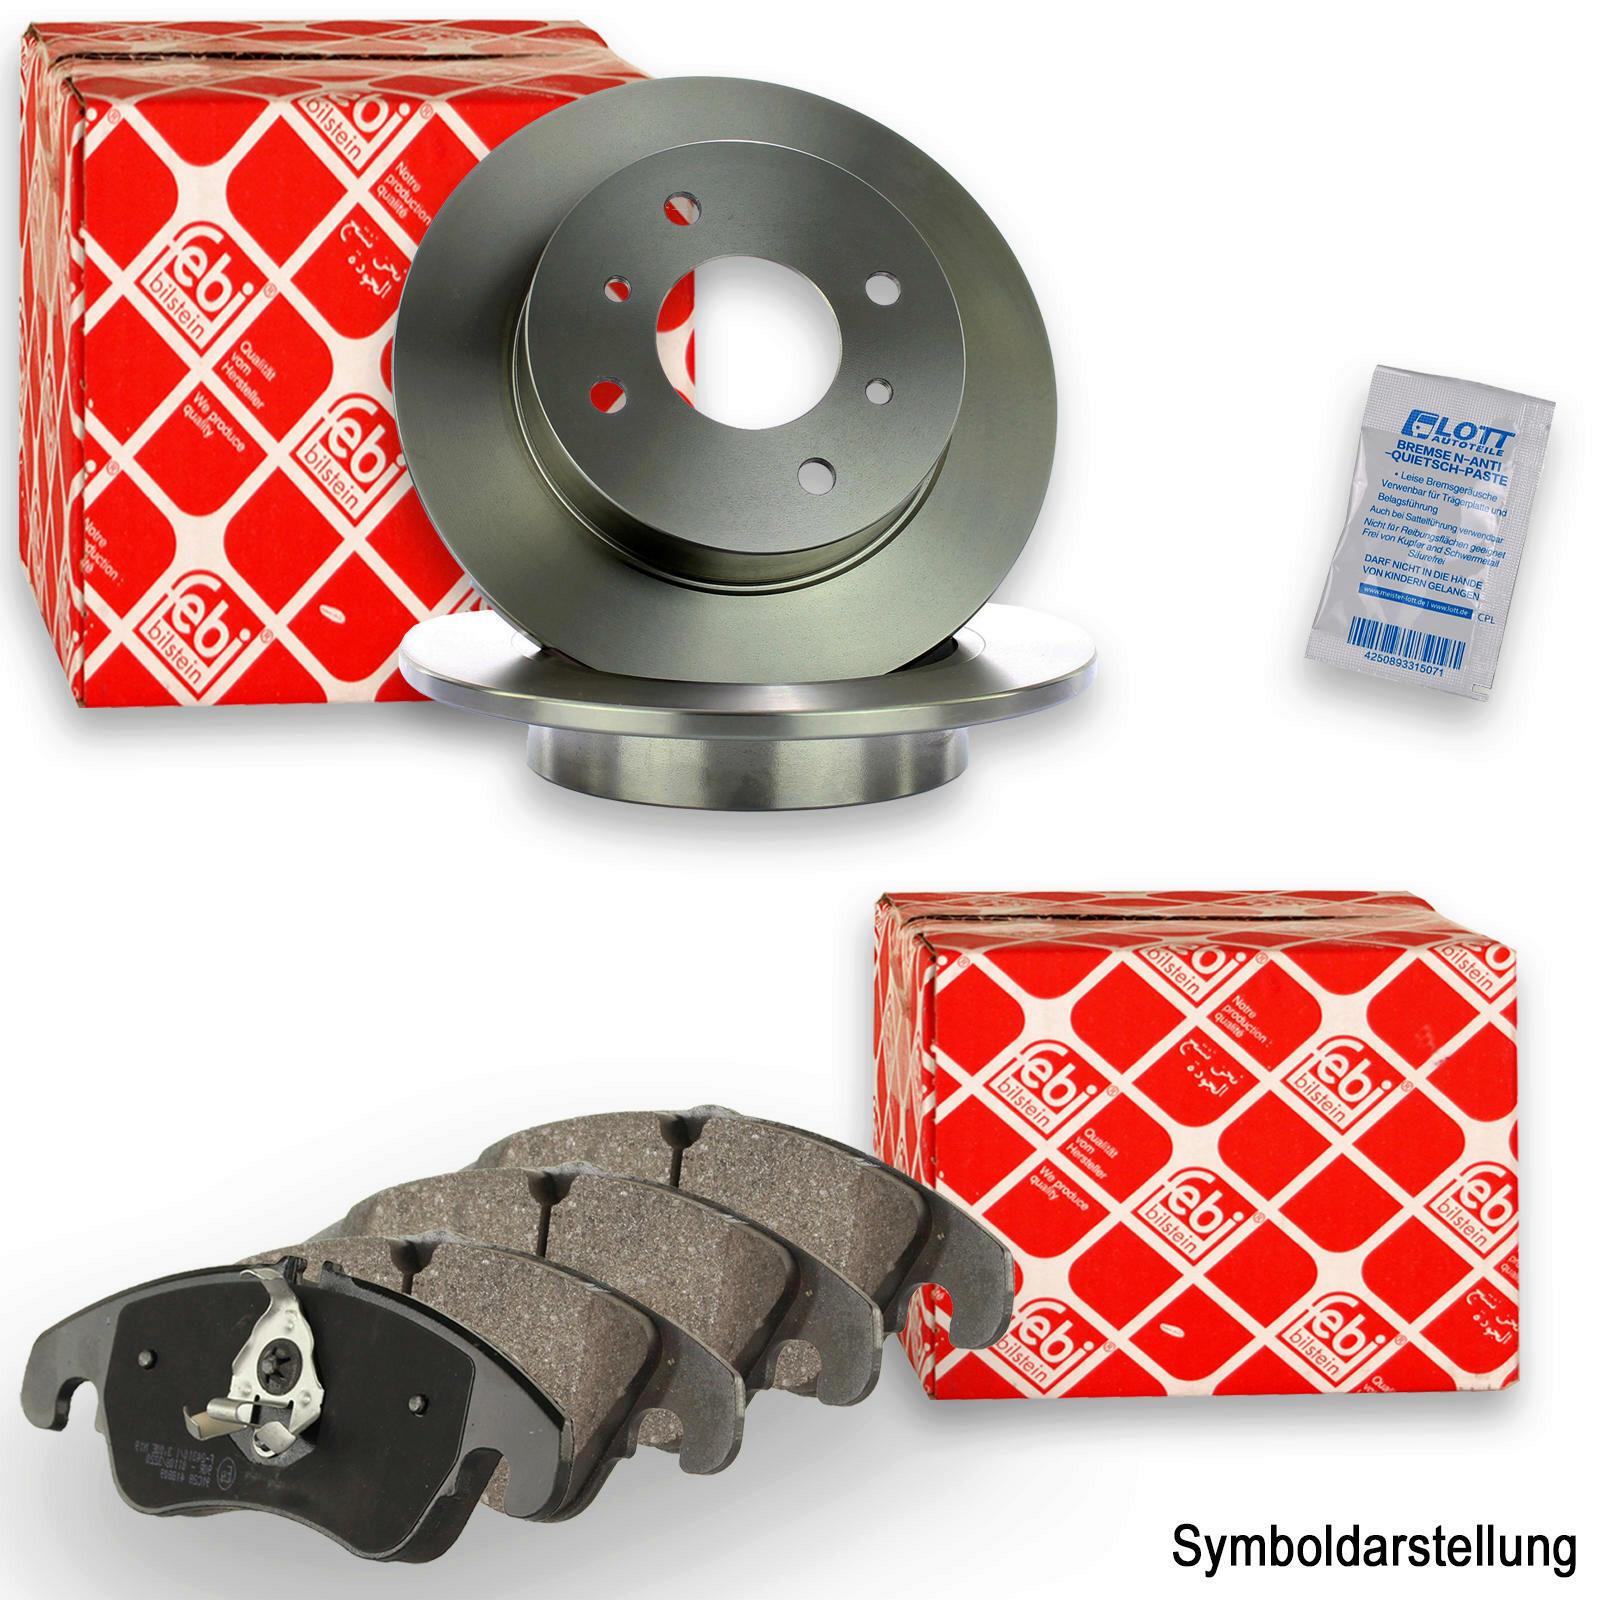 Bremsensatz Bremsen Set Kit hinten Ø 262mm System Mando für Hyundai i30 Kia Ceed